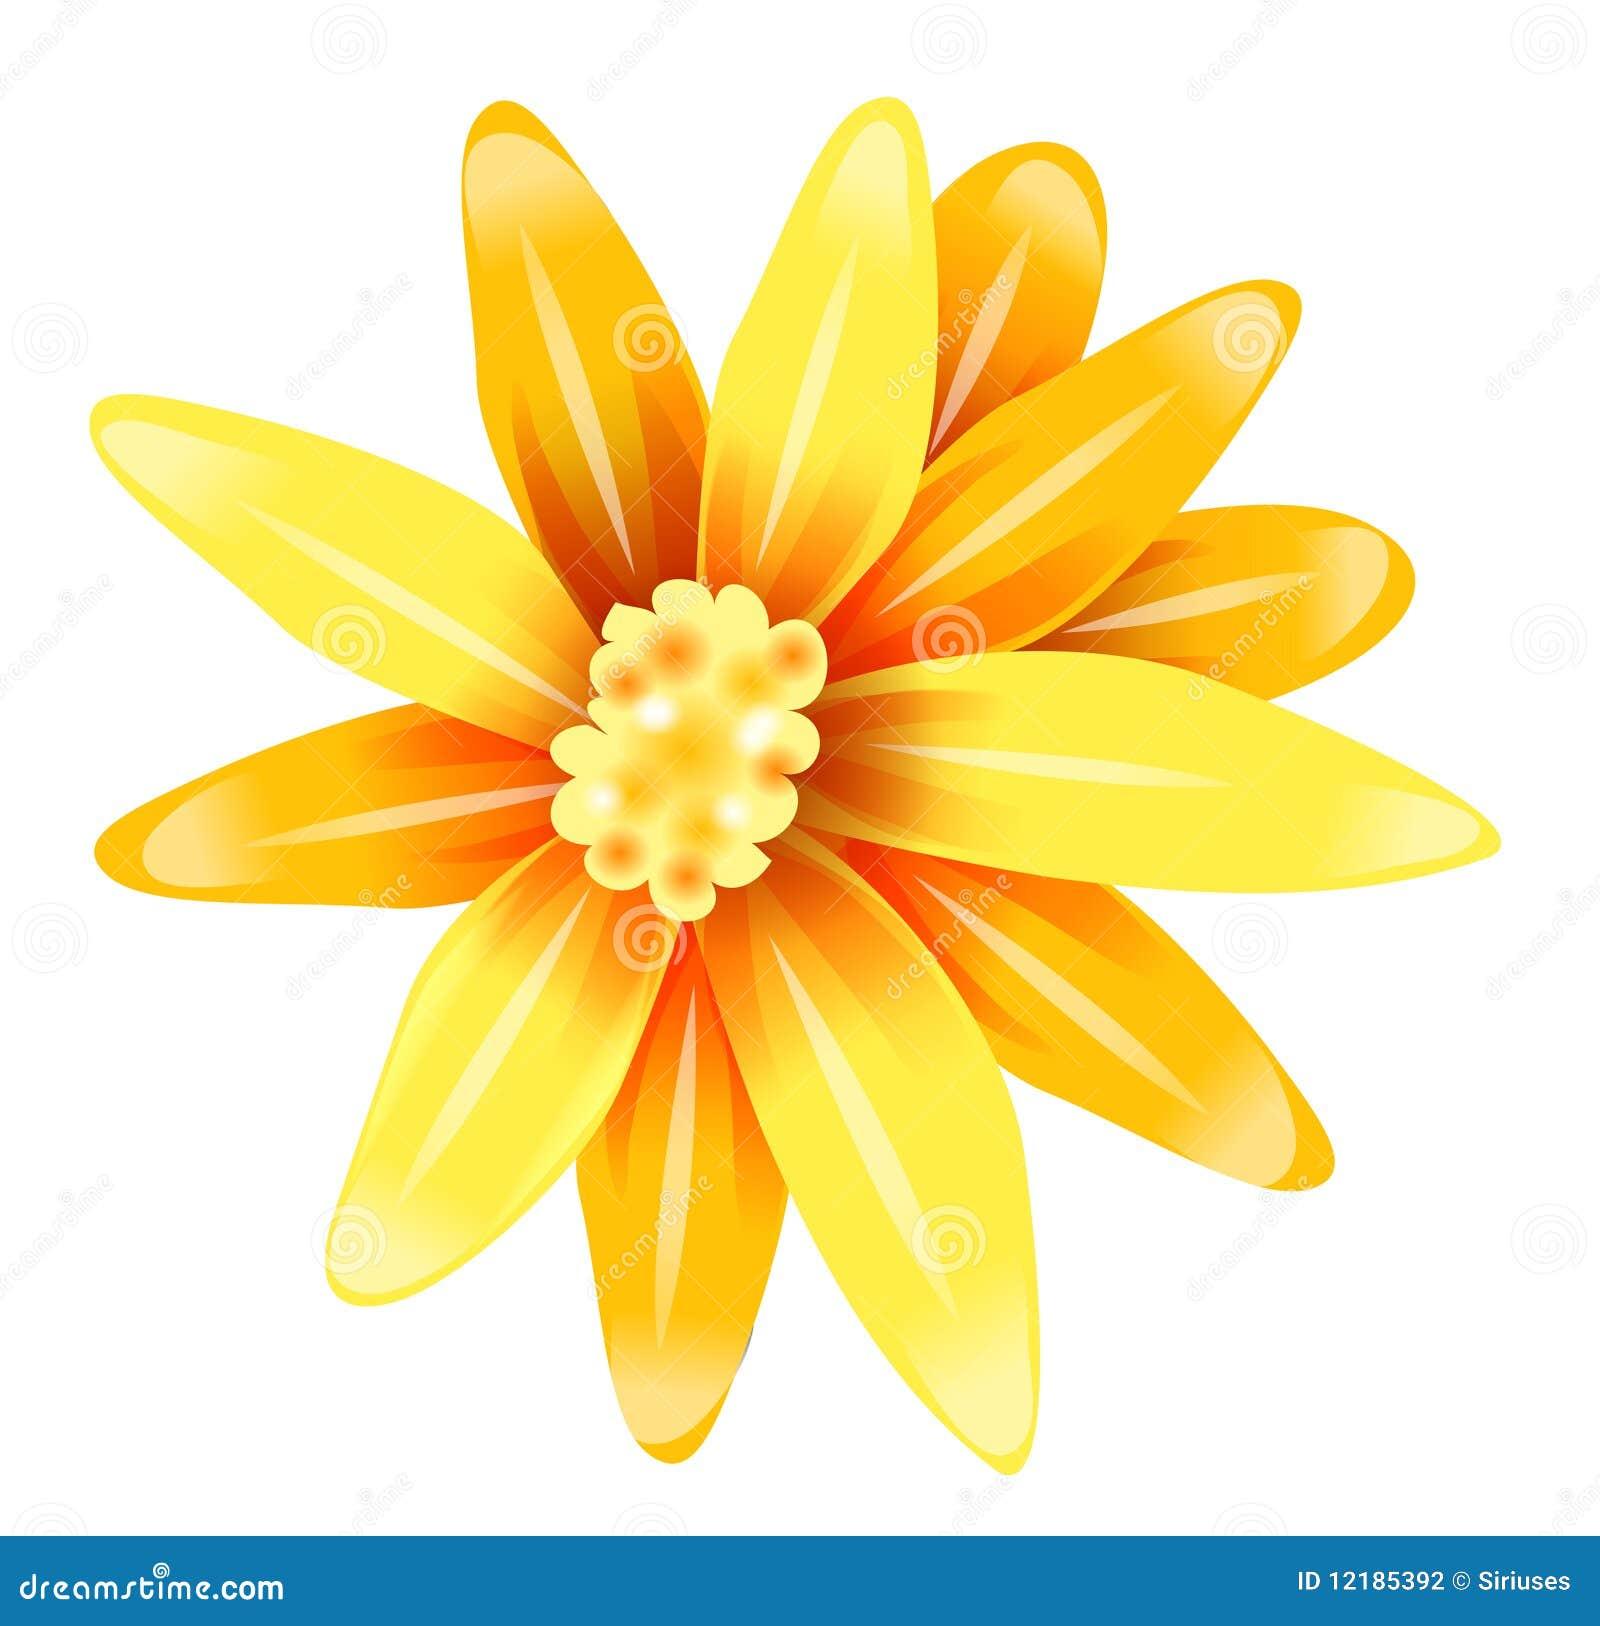 Yellow Daisy Flower Drawing Comousar